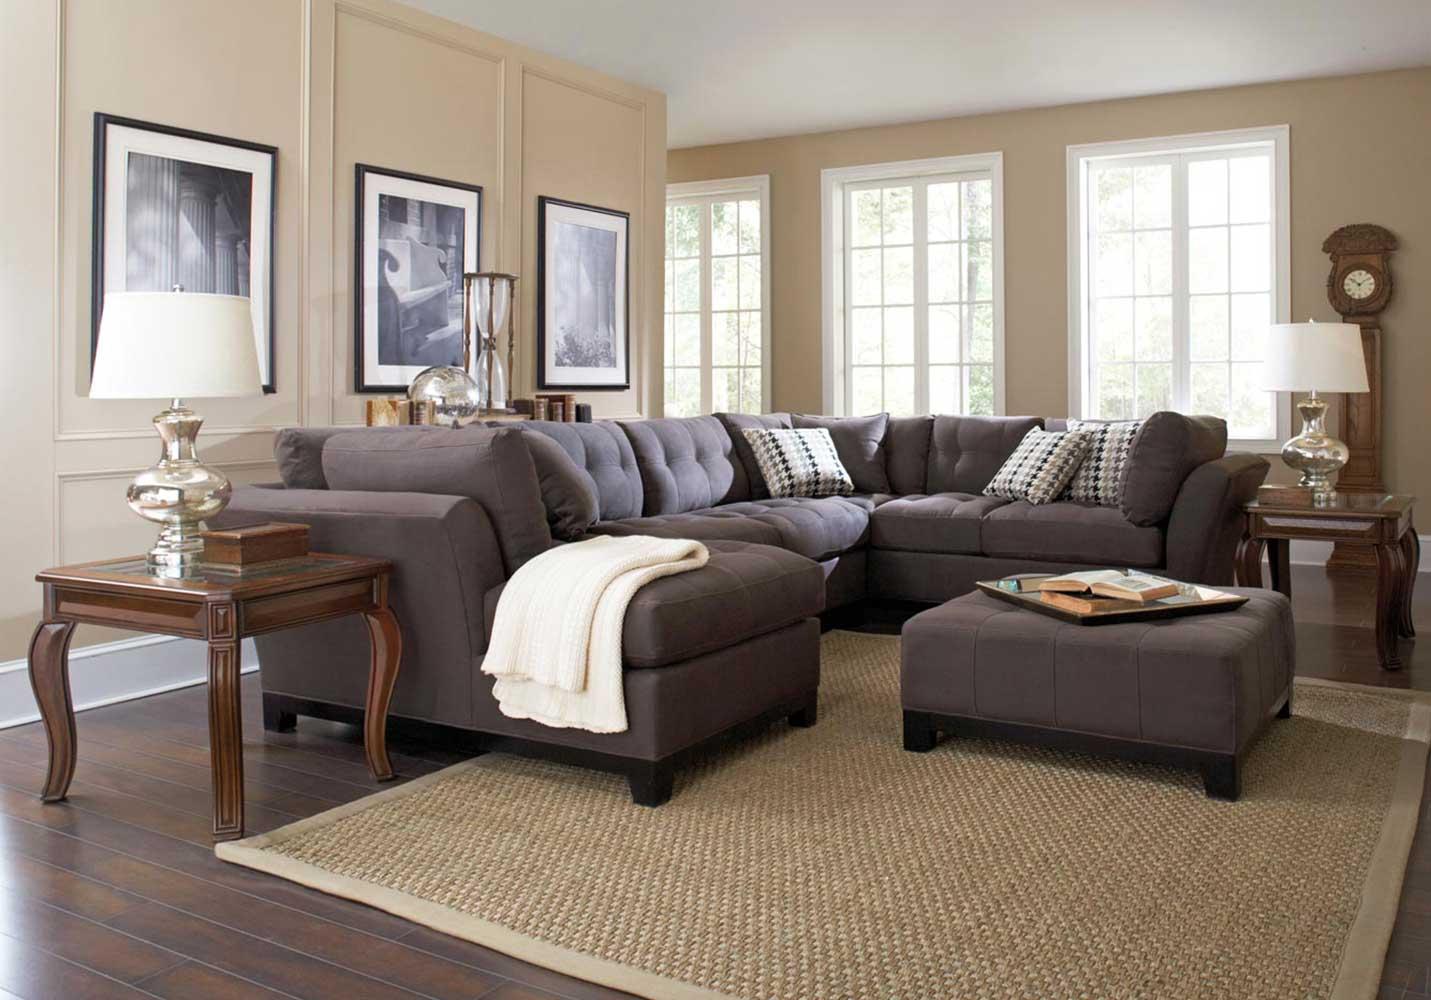 american furniture living room.  American Furniture Warehouse